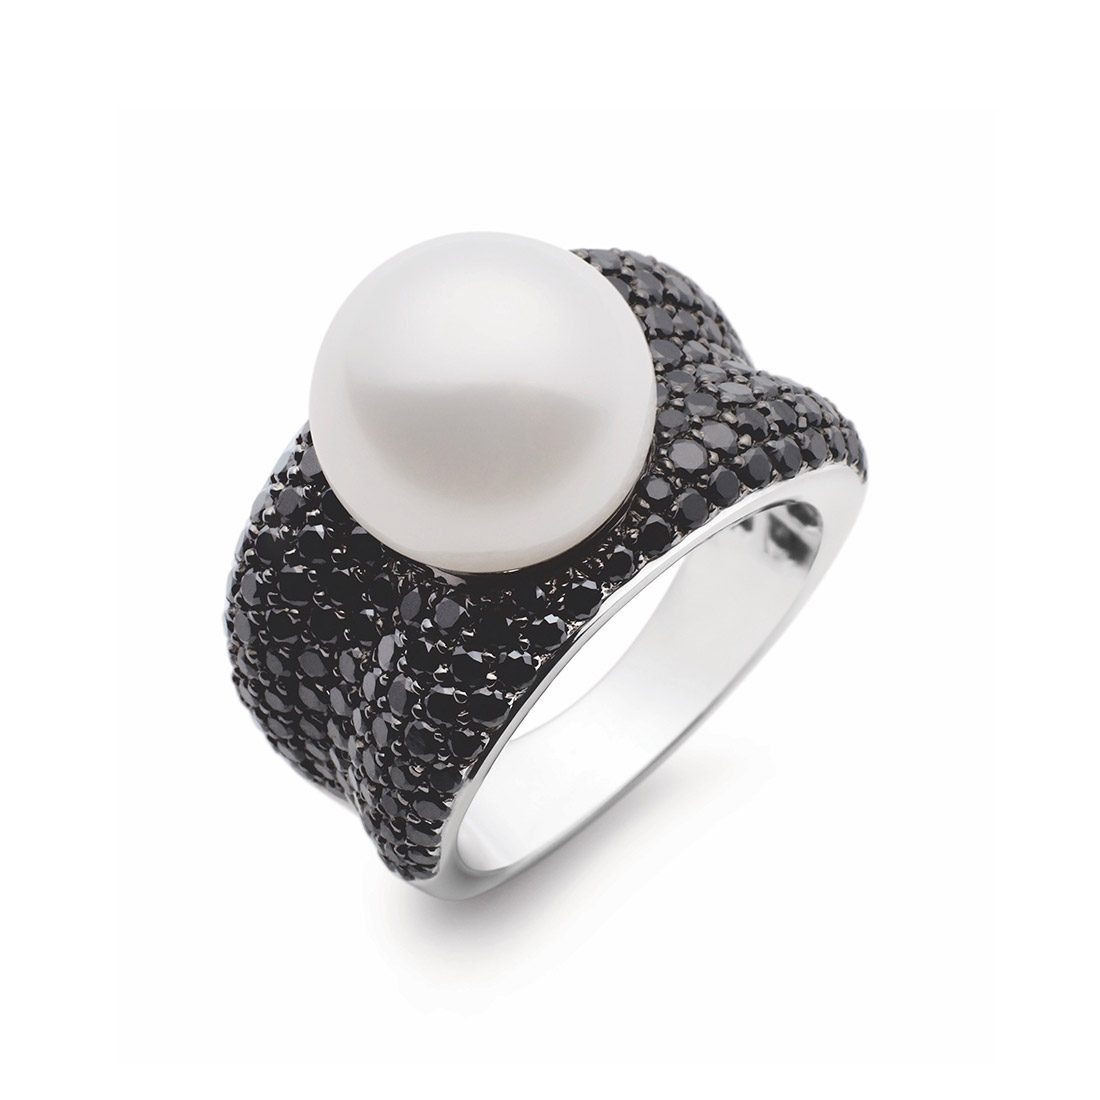 Kailis - Adored Pearl Black Diamond Ring